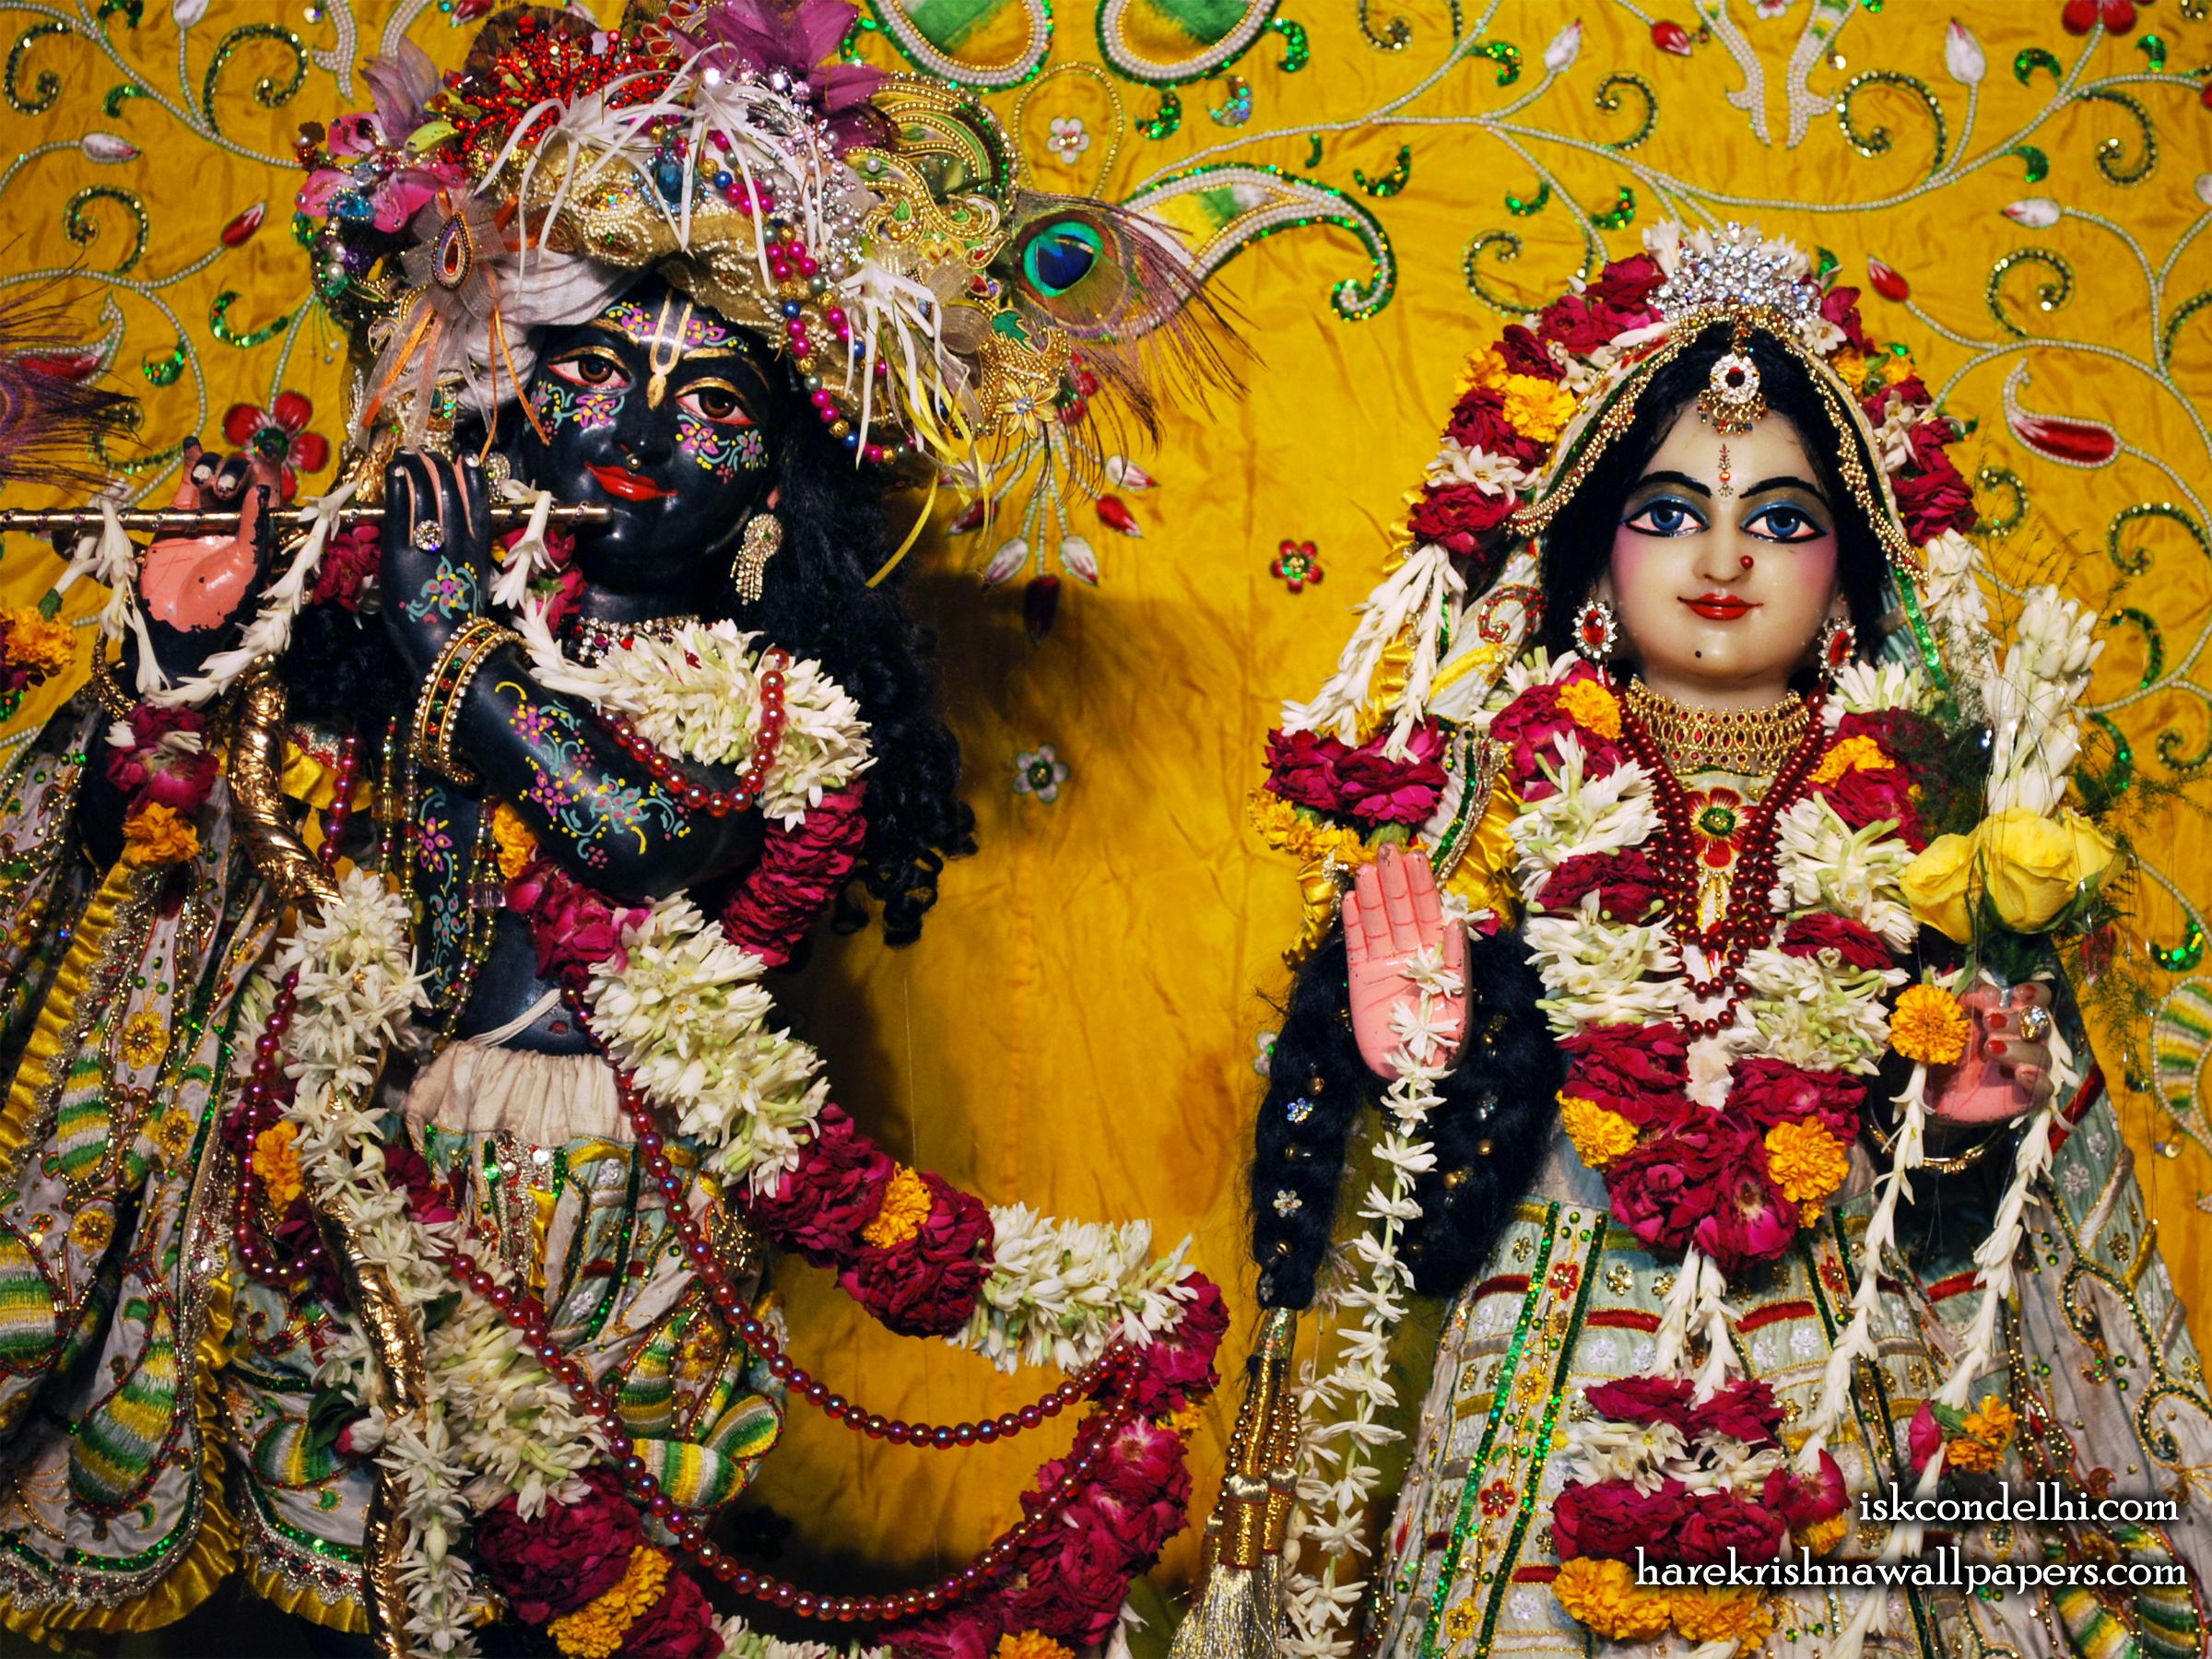 Sri Sri Radha Parthasarathi Close up Wallpaper (010) Size 2400x1800 Download